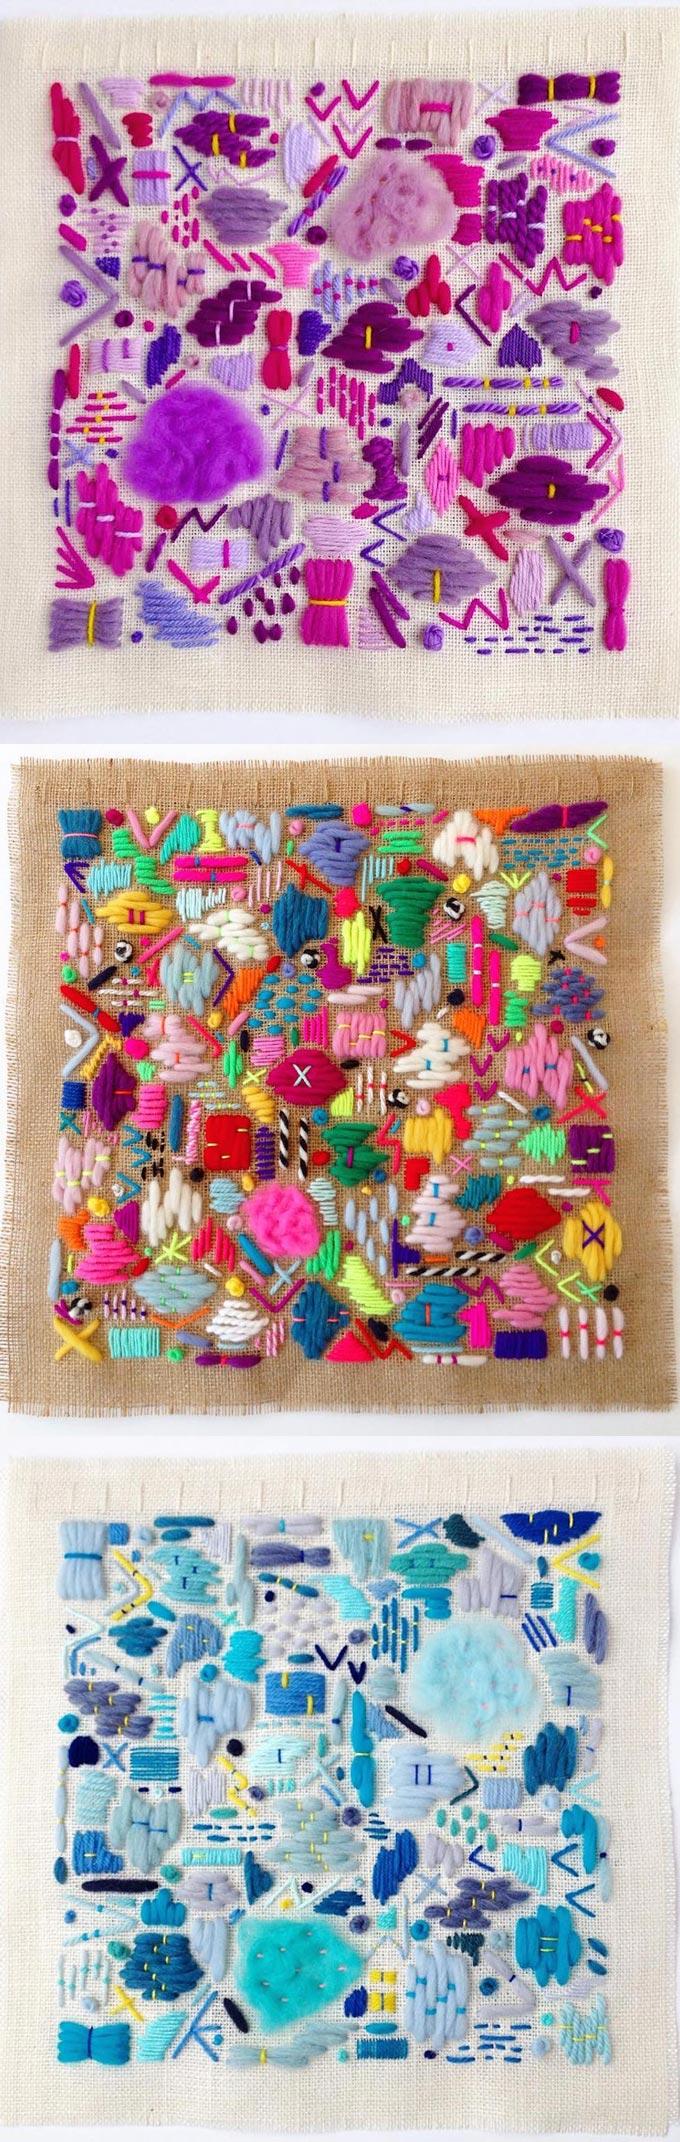 Elizabeth Pawle embroidery